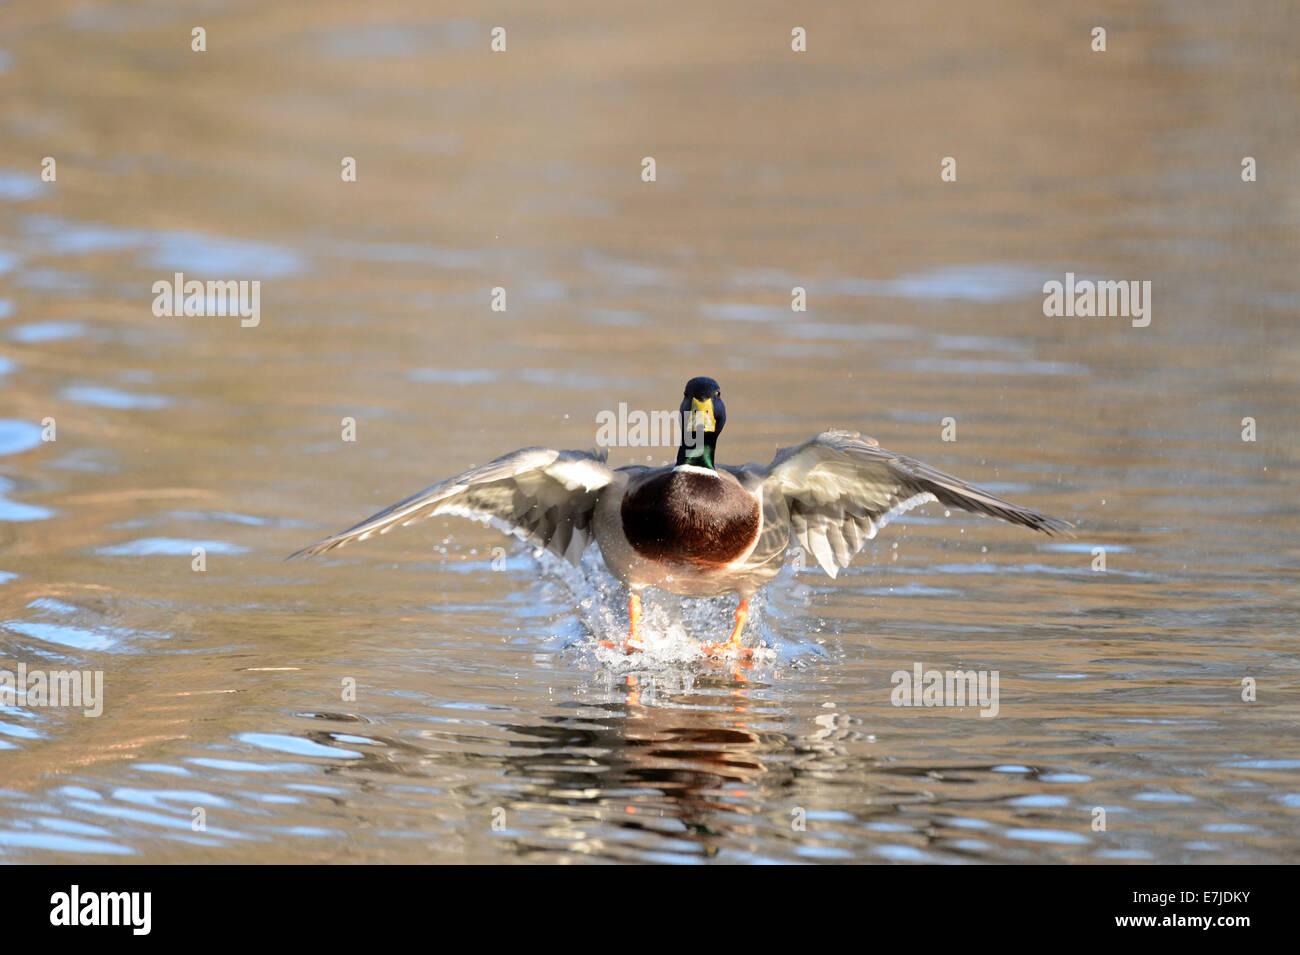 Duck, Mallard, Wild Duck, Diving Duck, Ducks, Water Birds